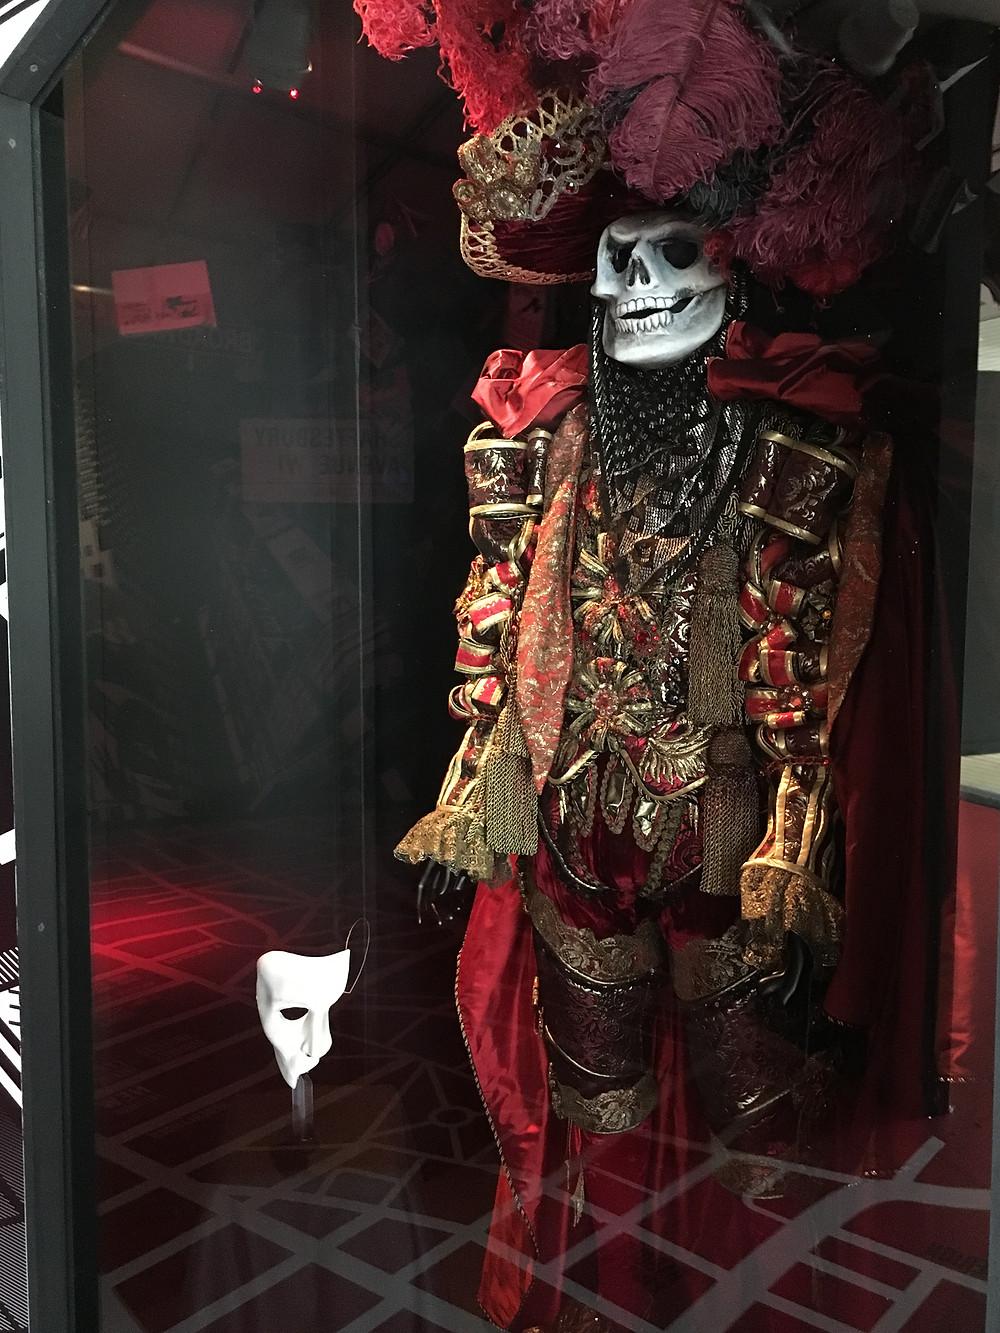 Masquerade costume from Phantom of the Opera